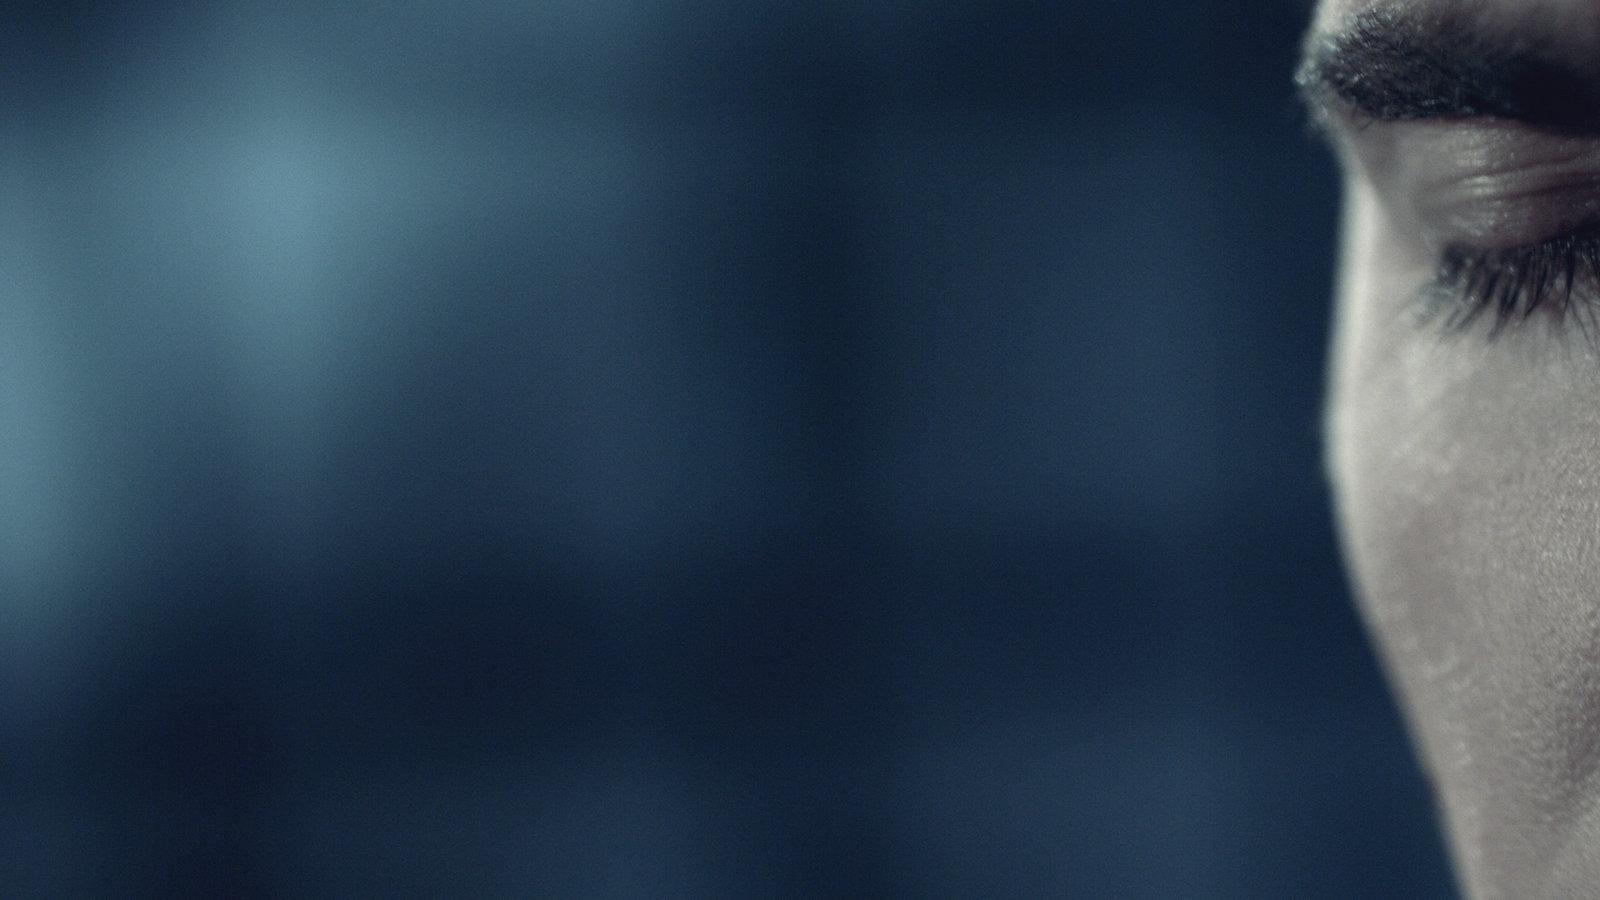 DigitalHub_SMWA_Master_4K (1-00-12-08).j